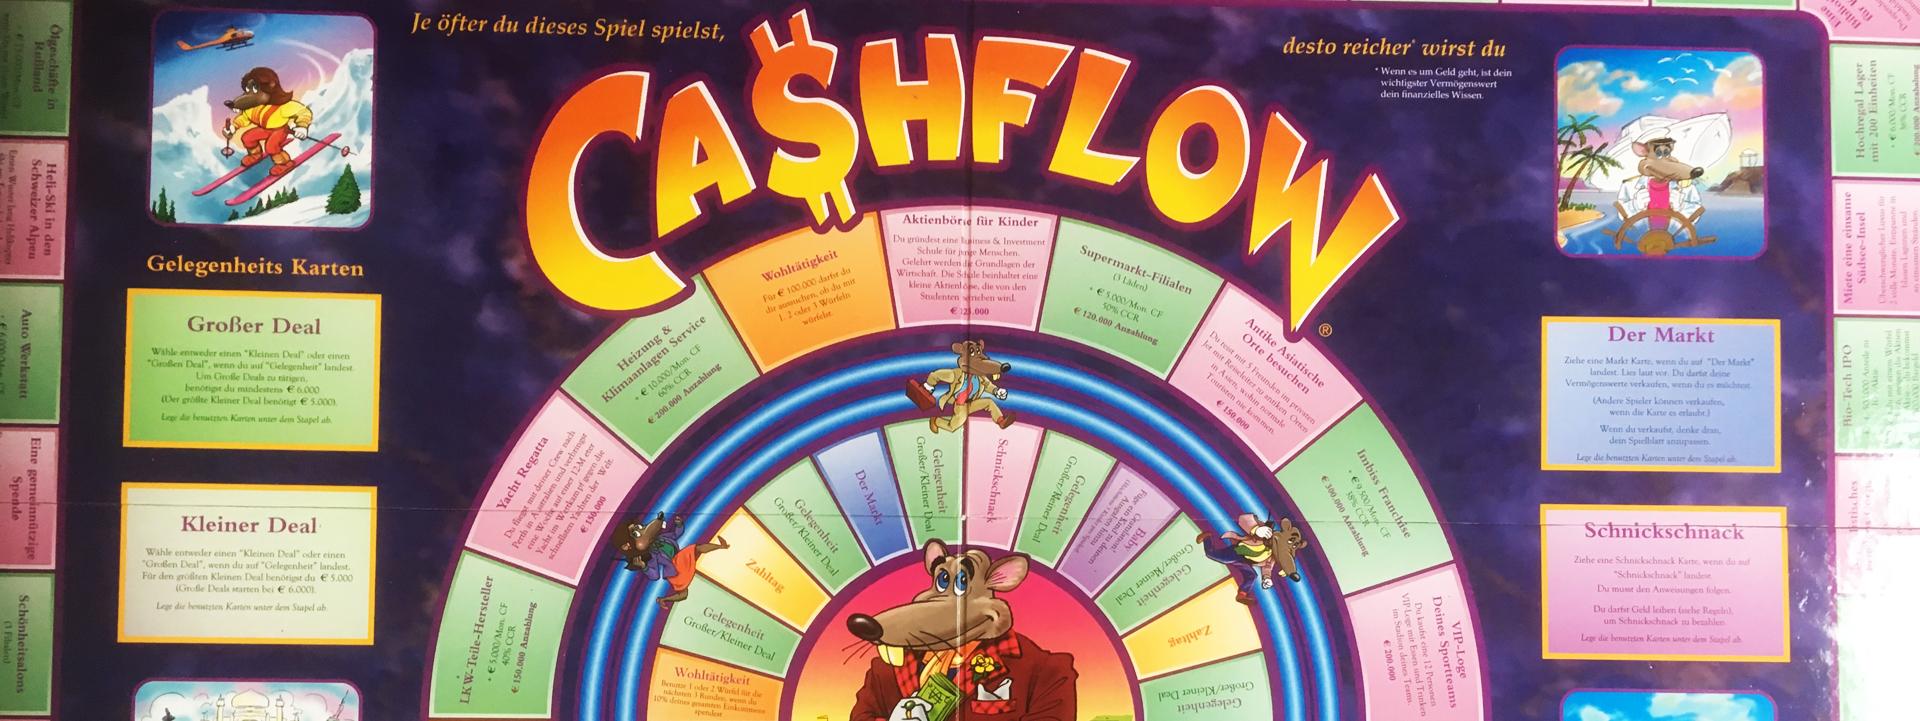 Cashflowspiel1920x700